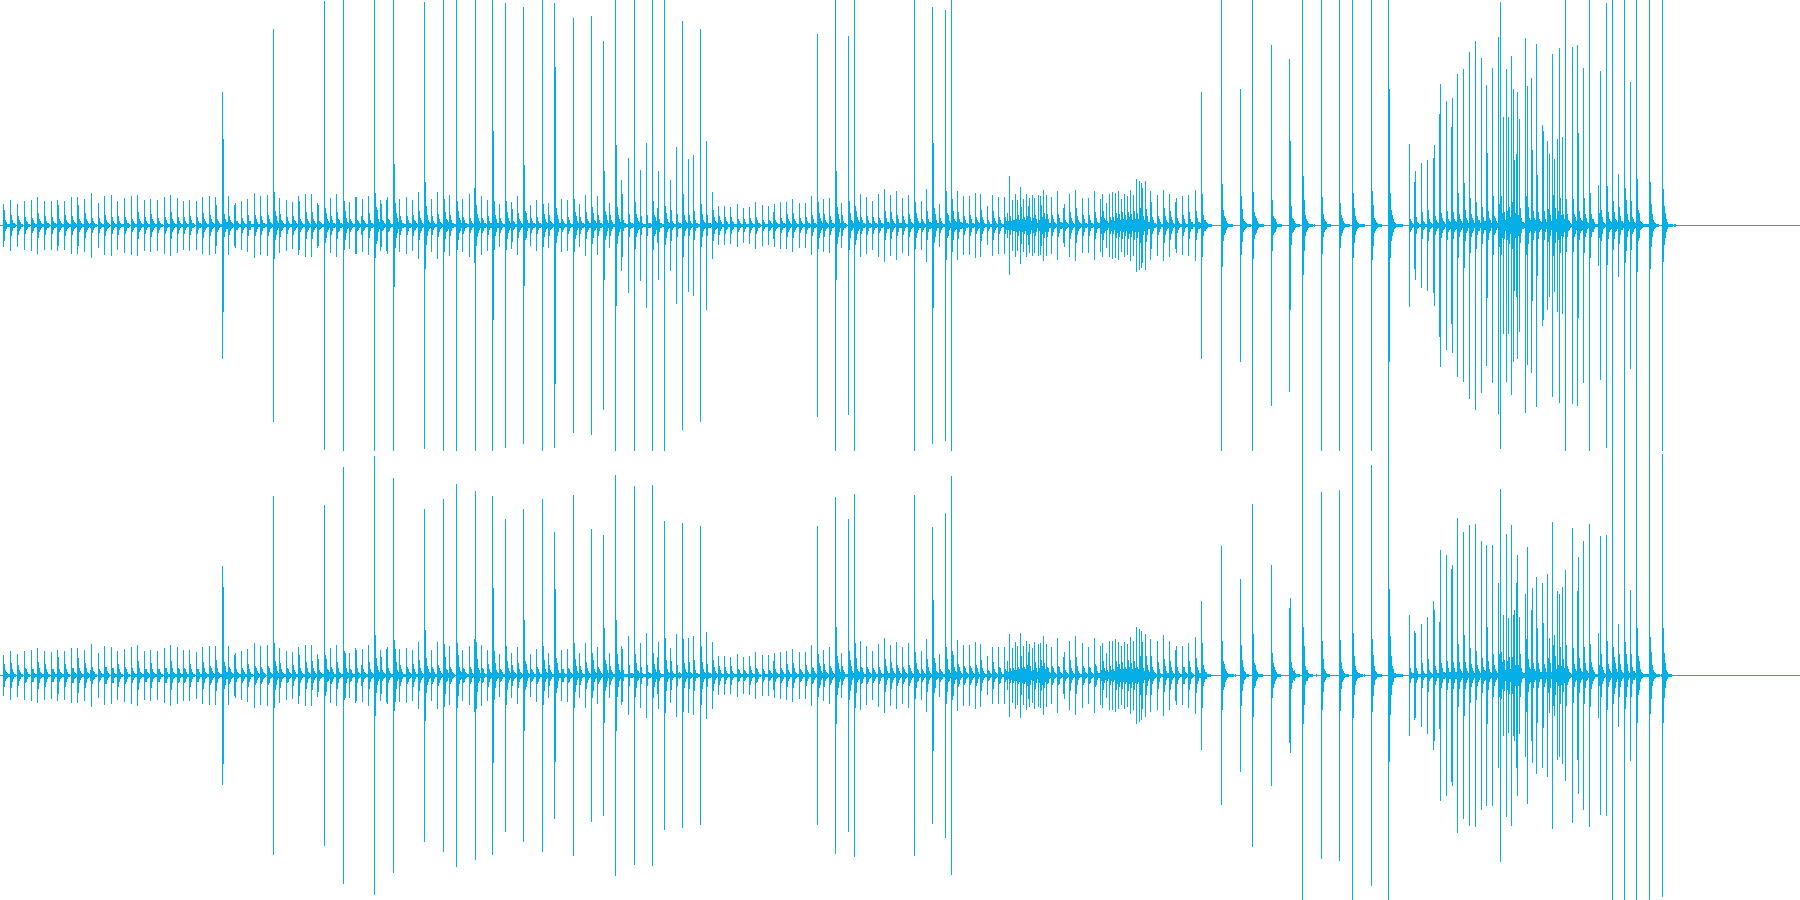 小木魚木章9歌舞伎黒御簾下座音楽和風日本の再生済みの波形